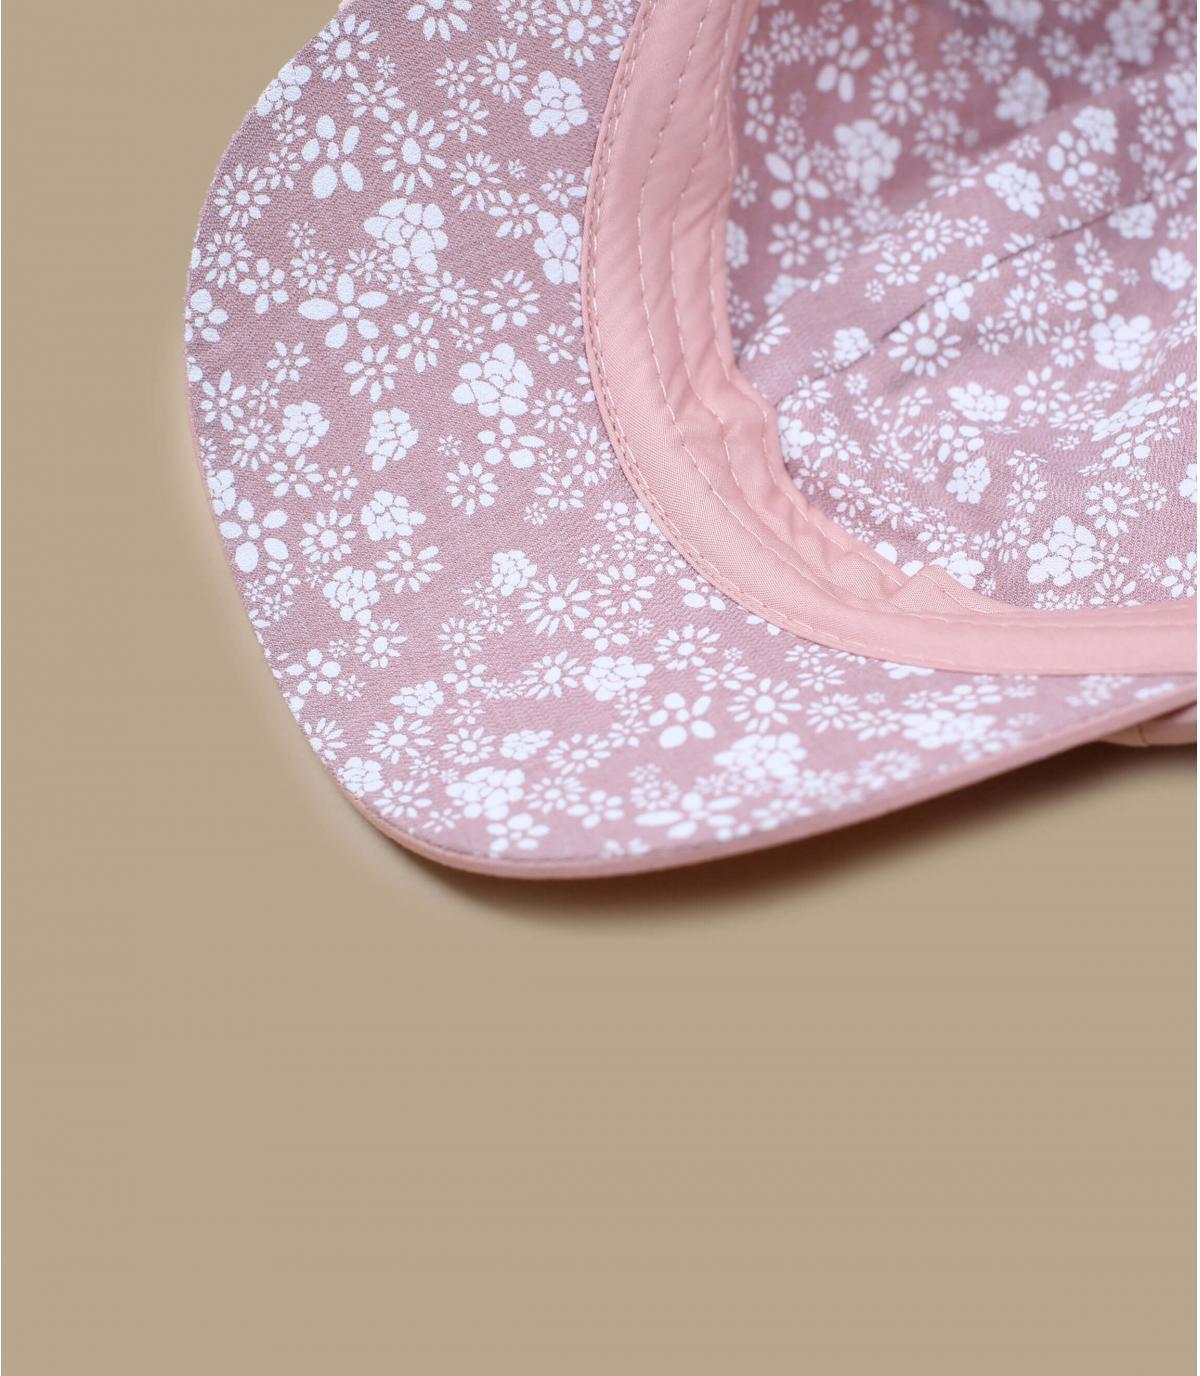 Detalles Wupper dusty pink imagen 4